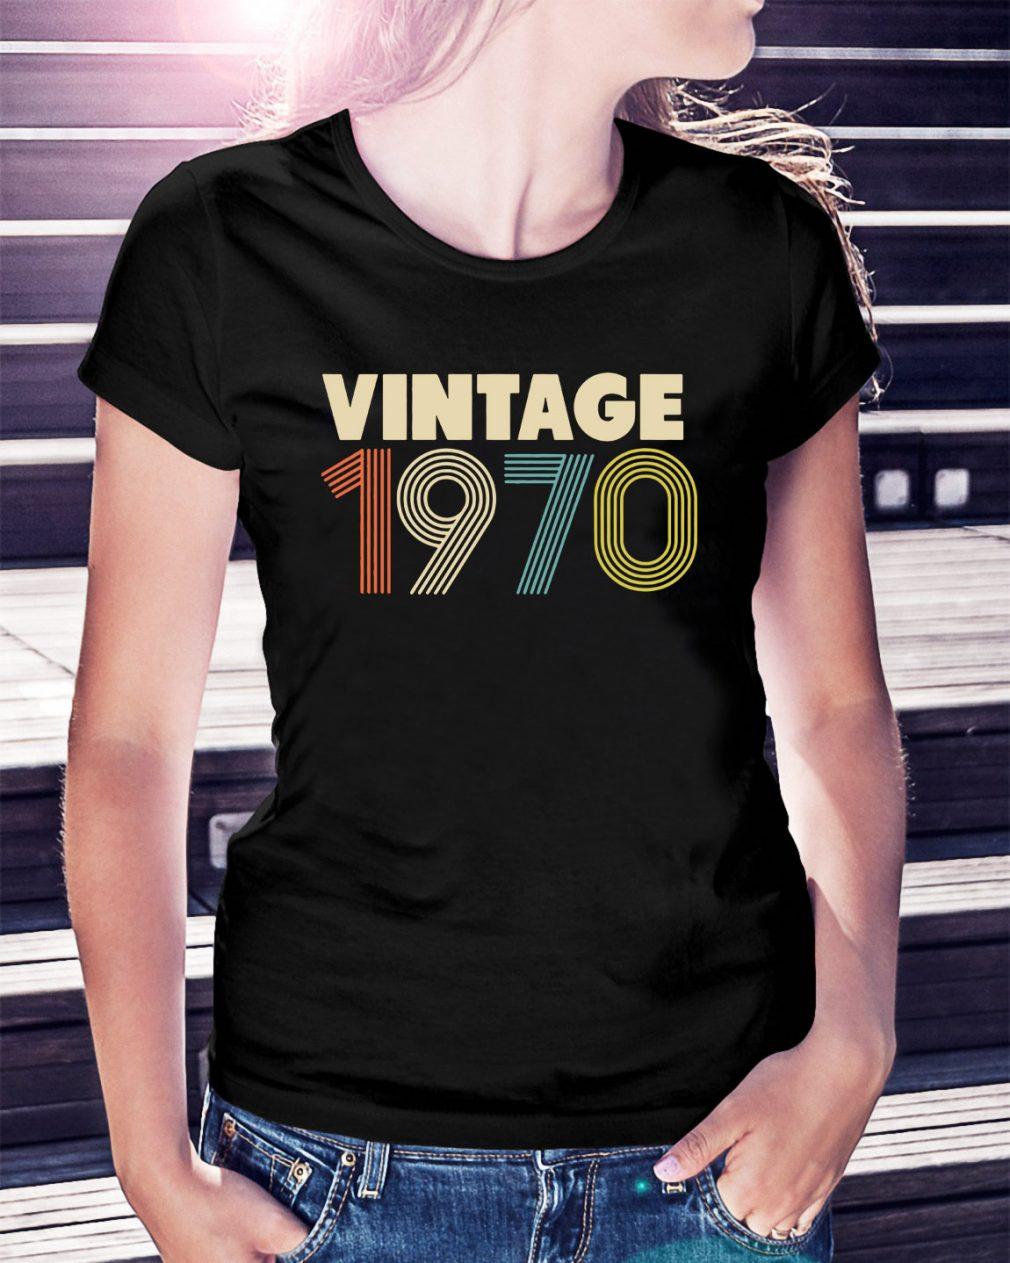 Retro Vintage 1970 48th Birthday Ladies Tee